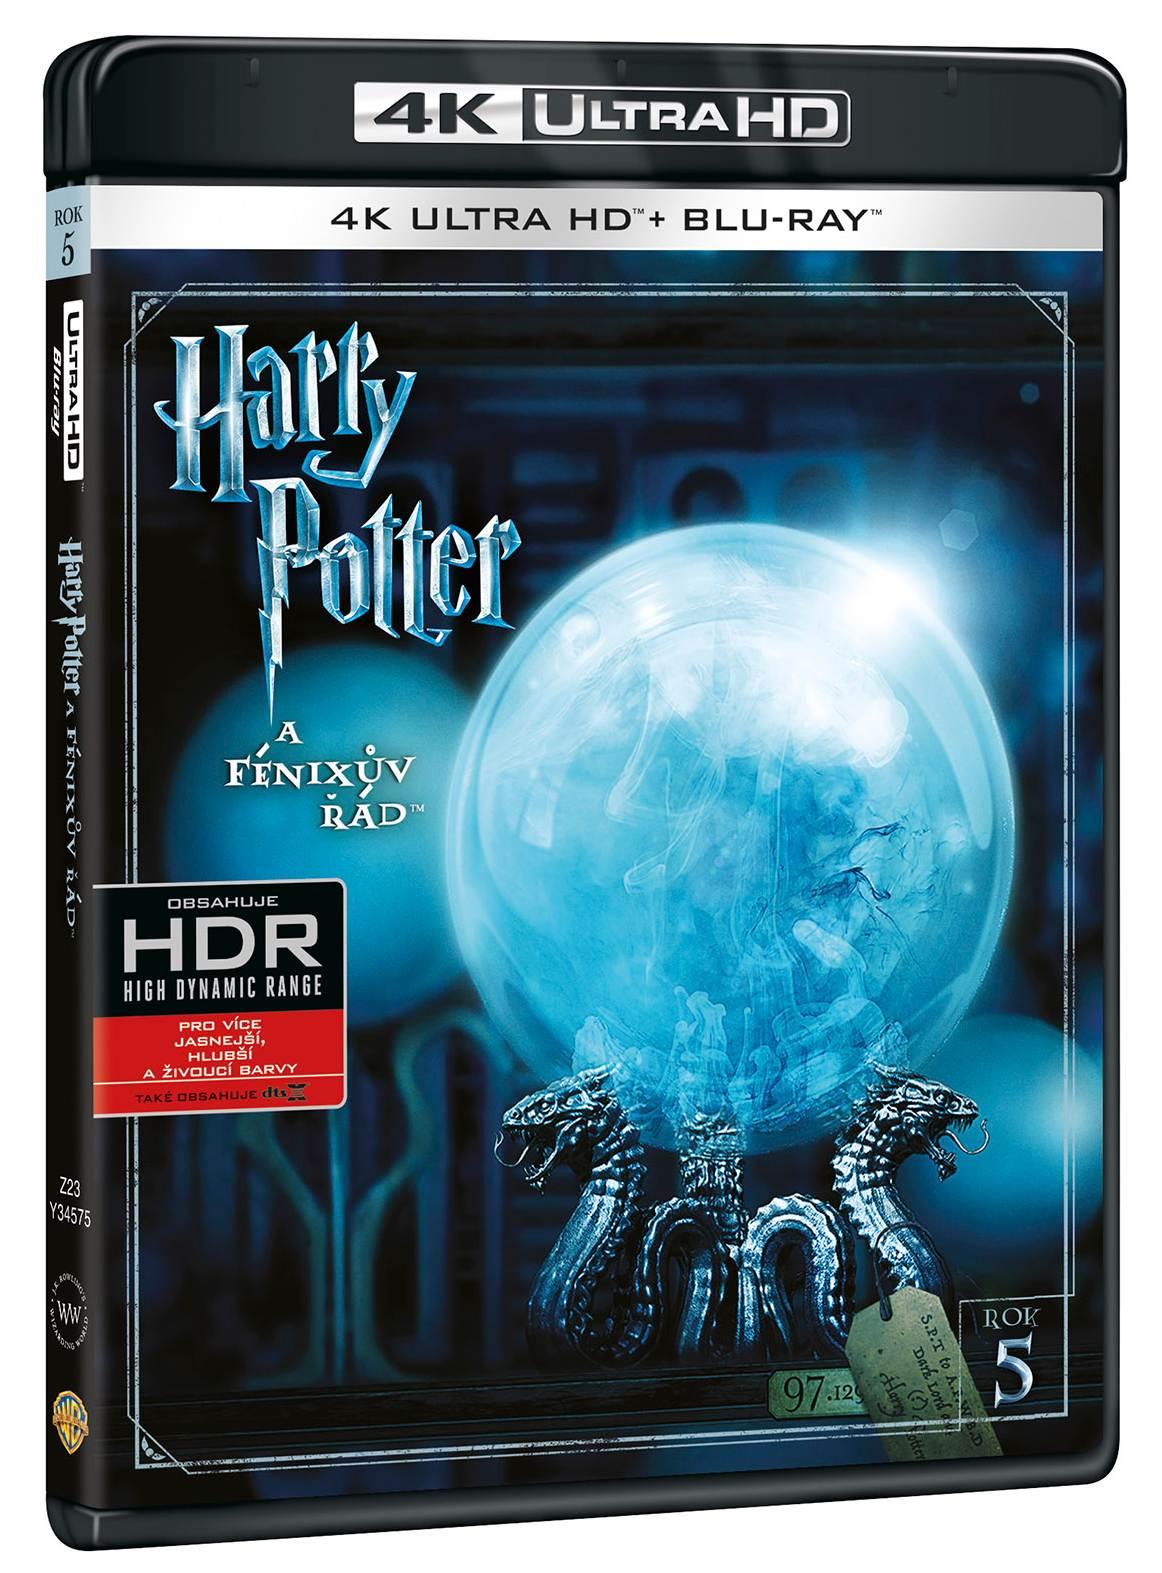 HARRY POTTER A FÉNIXŮV ŘÁD (4K ULTRA HD) - UHD Blu-ray + Blu-ray (2 BD)